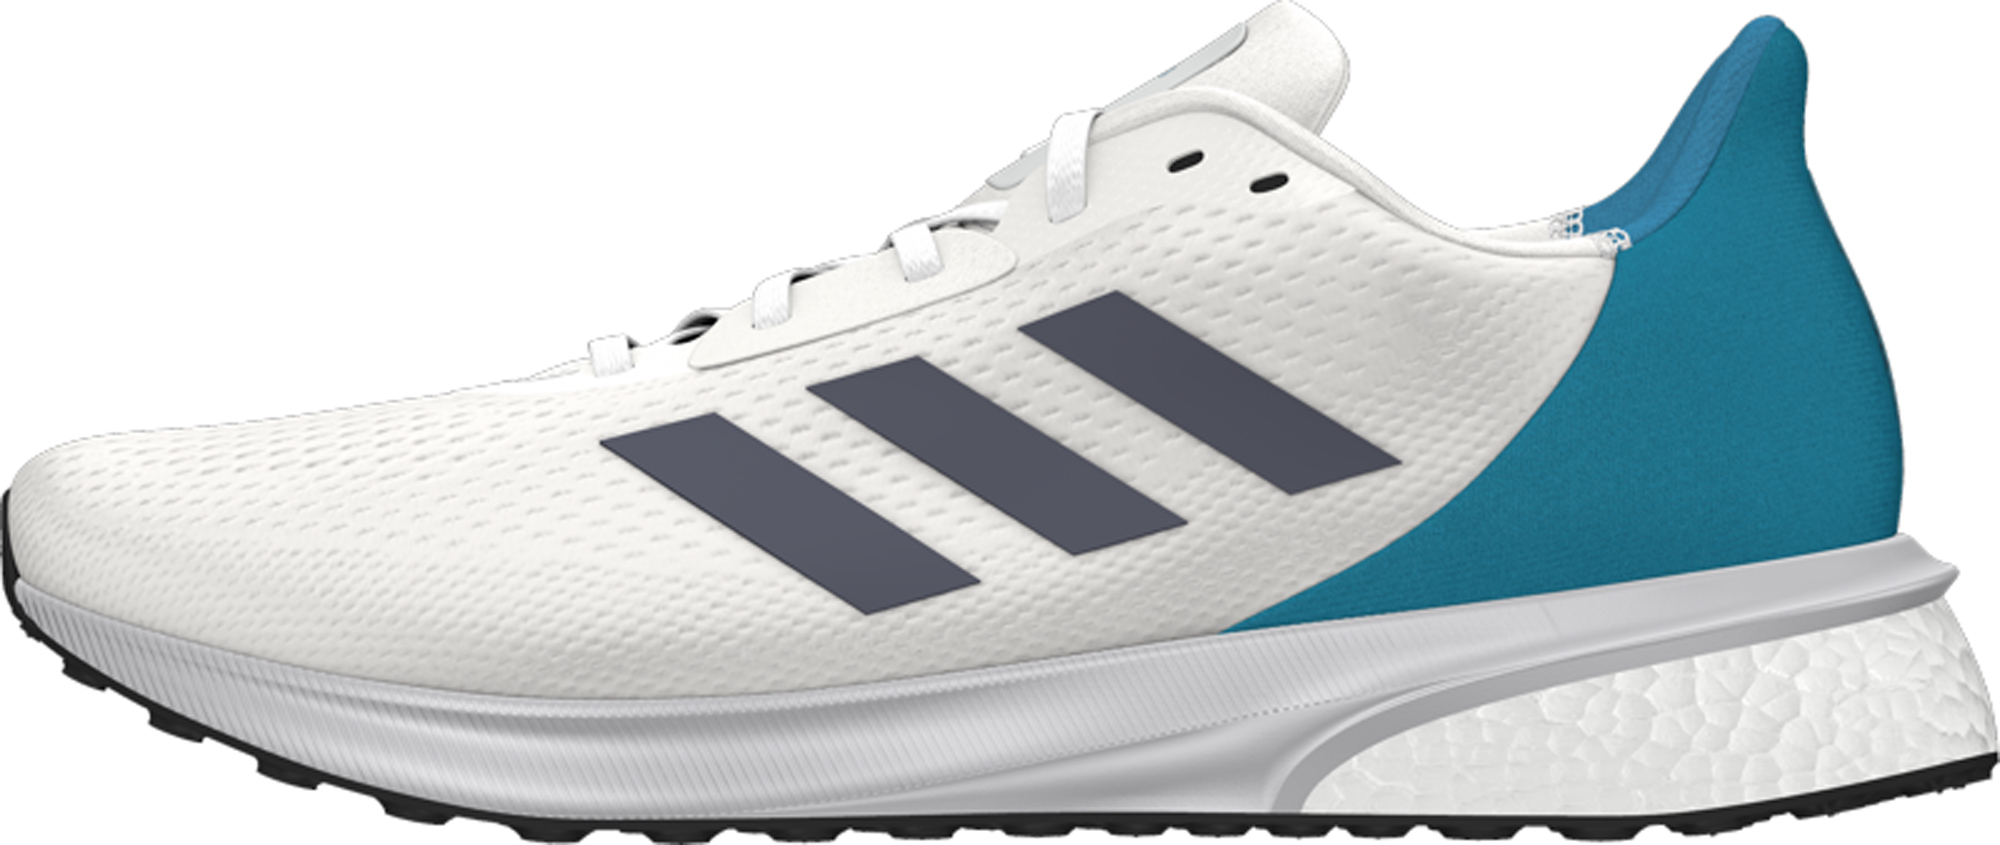 Adidas Кроссовки женские Adidas Astrarun, размер 40 тайтсы женские adidas how we do tight цвет серый dp3958 размер xs 40 42